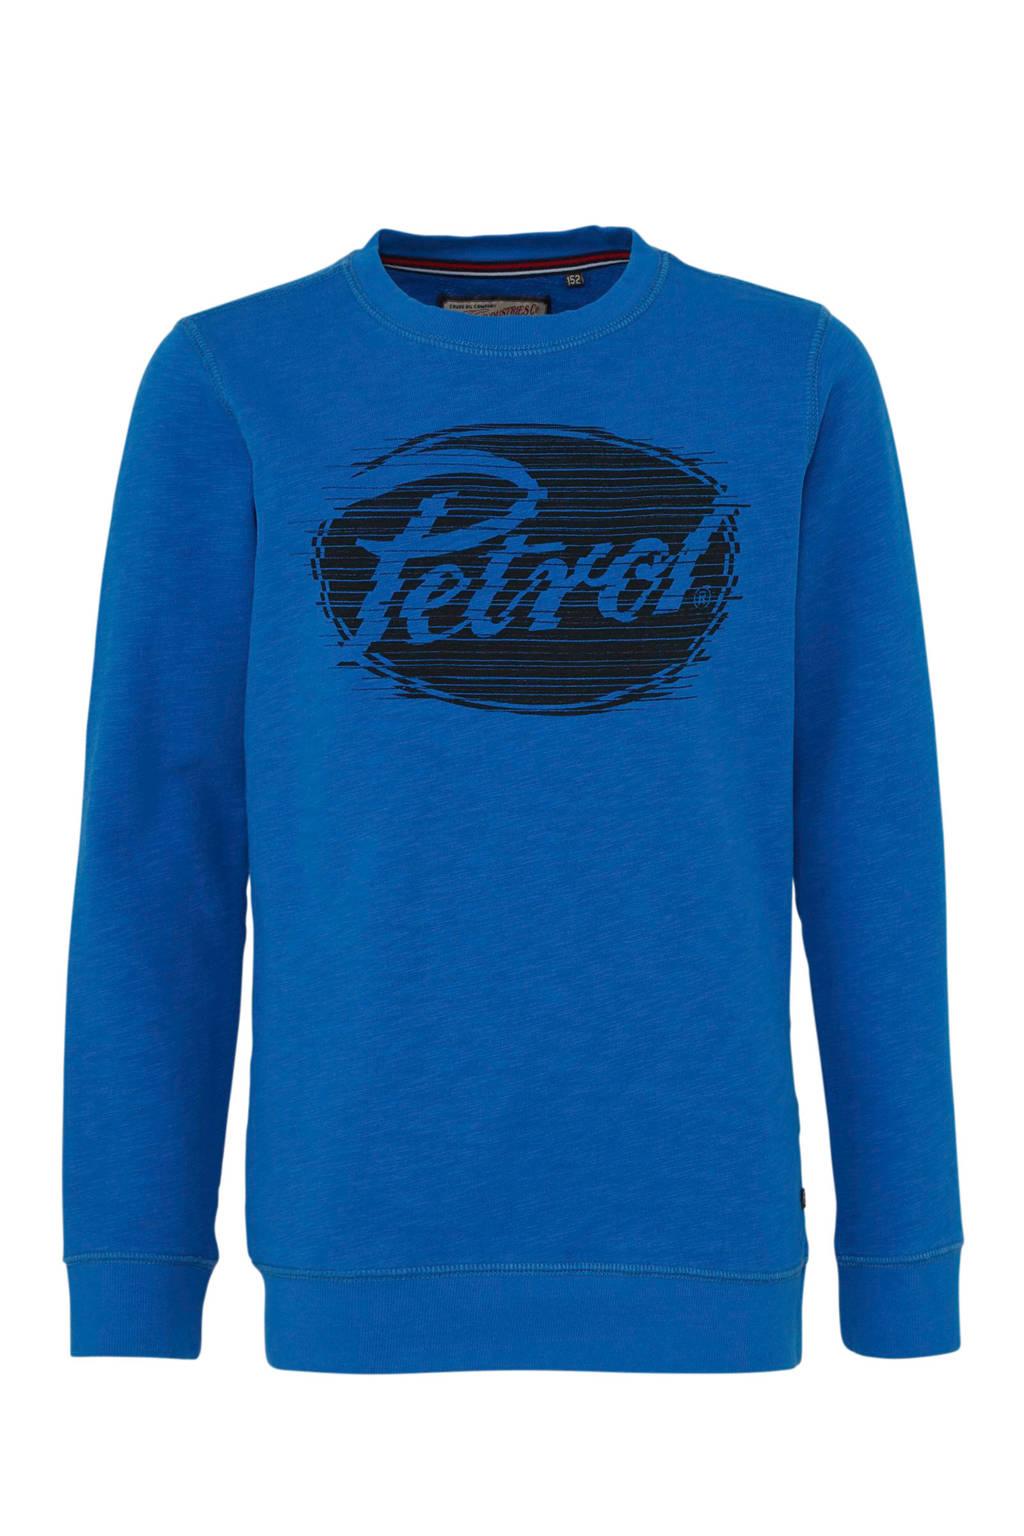 Petrol Industries sweater met logo kobaltblauw, Kobaltblauw